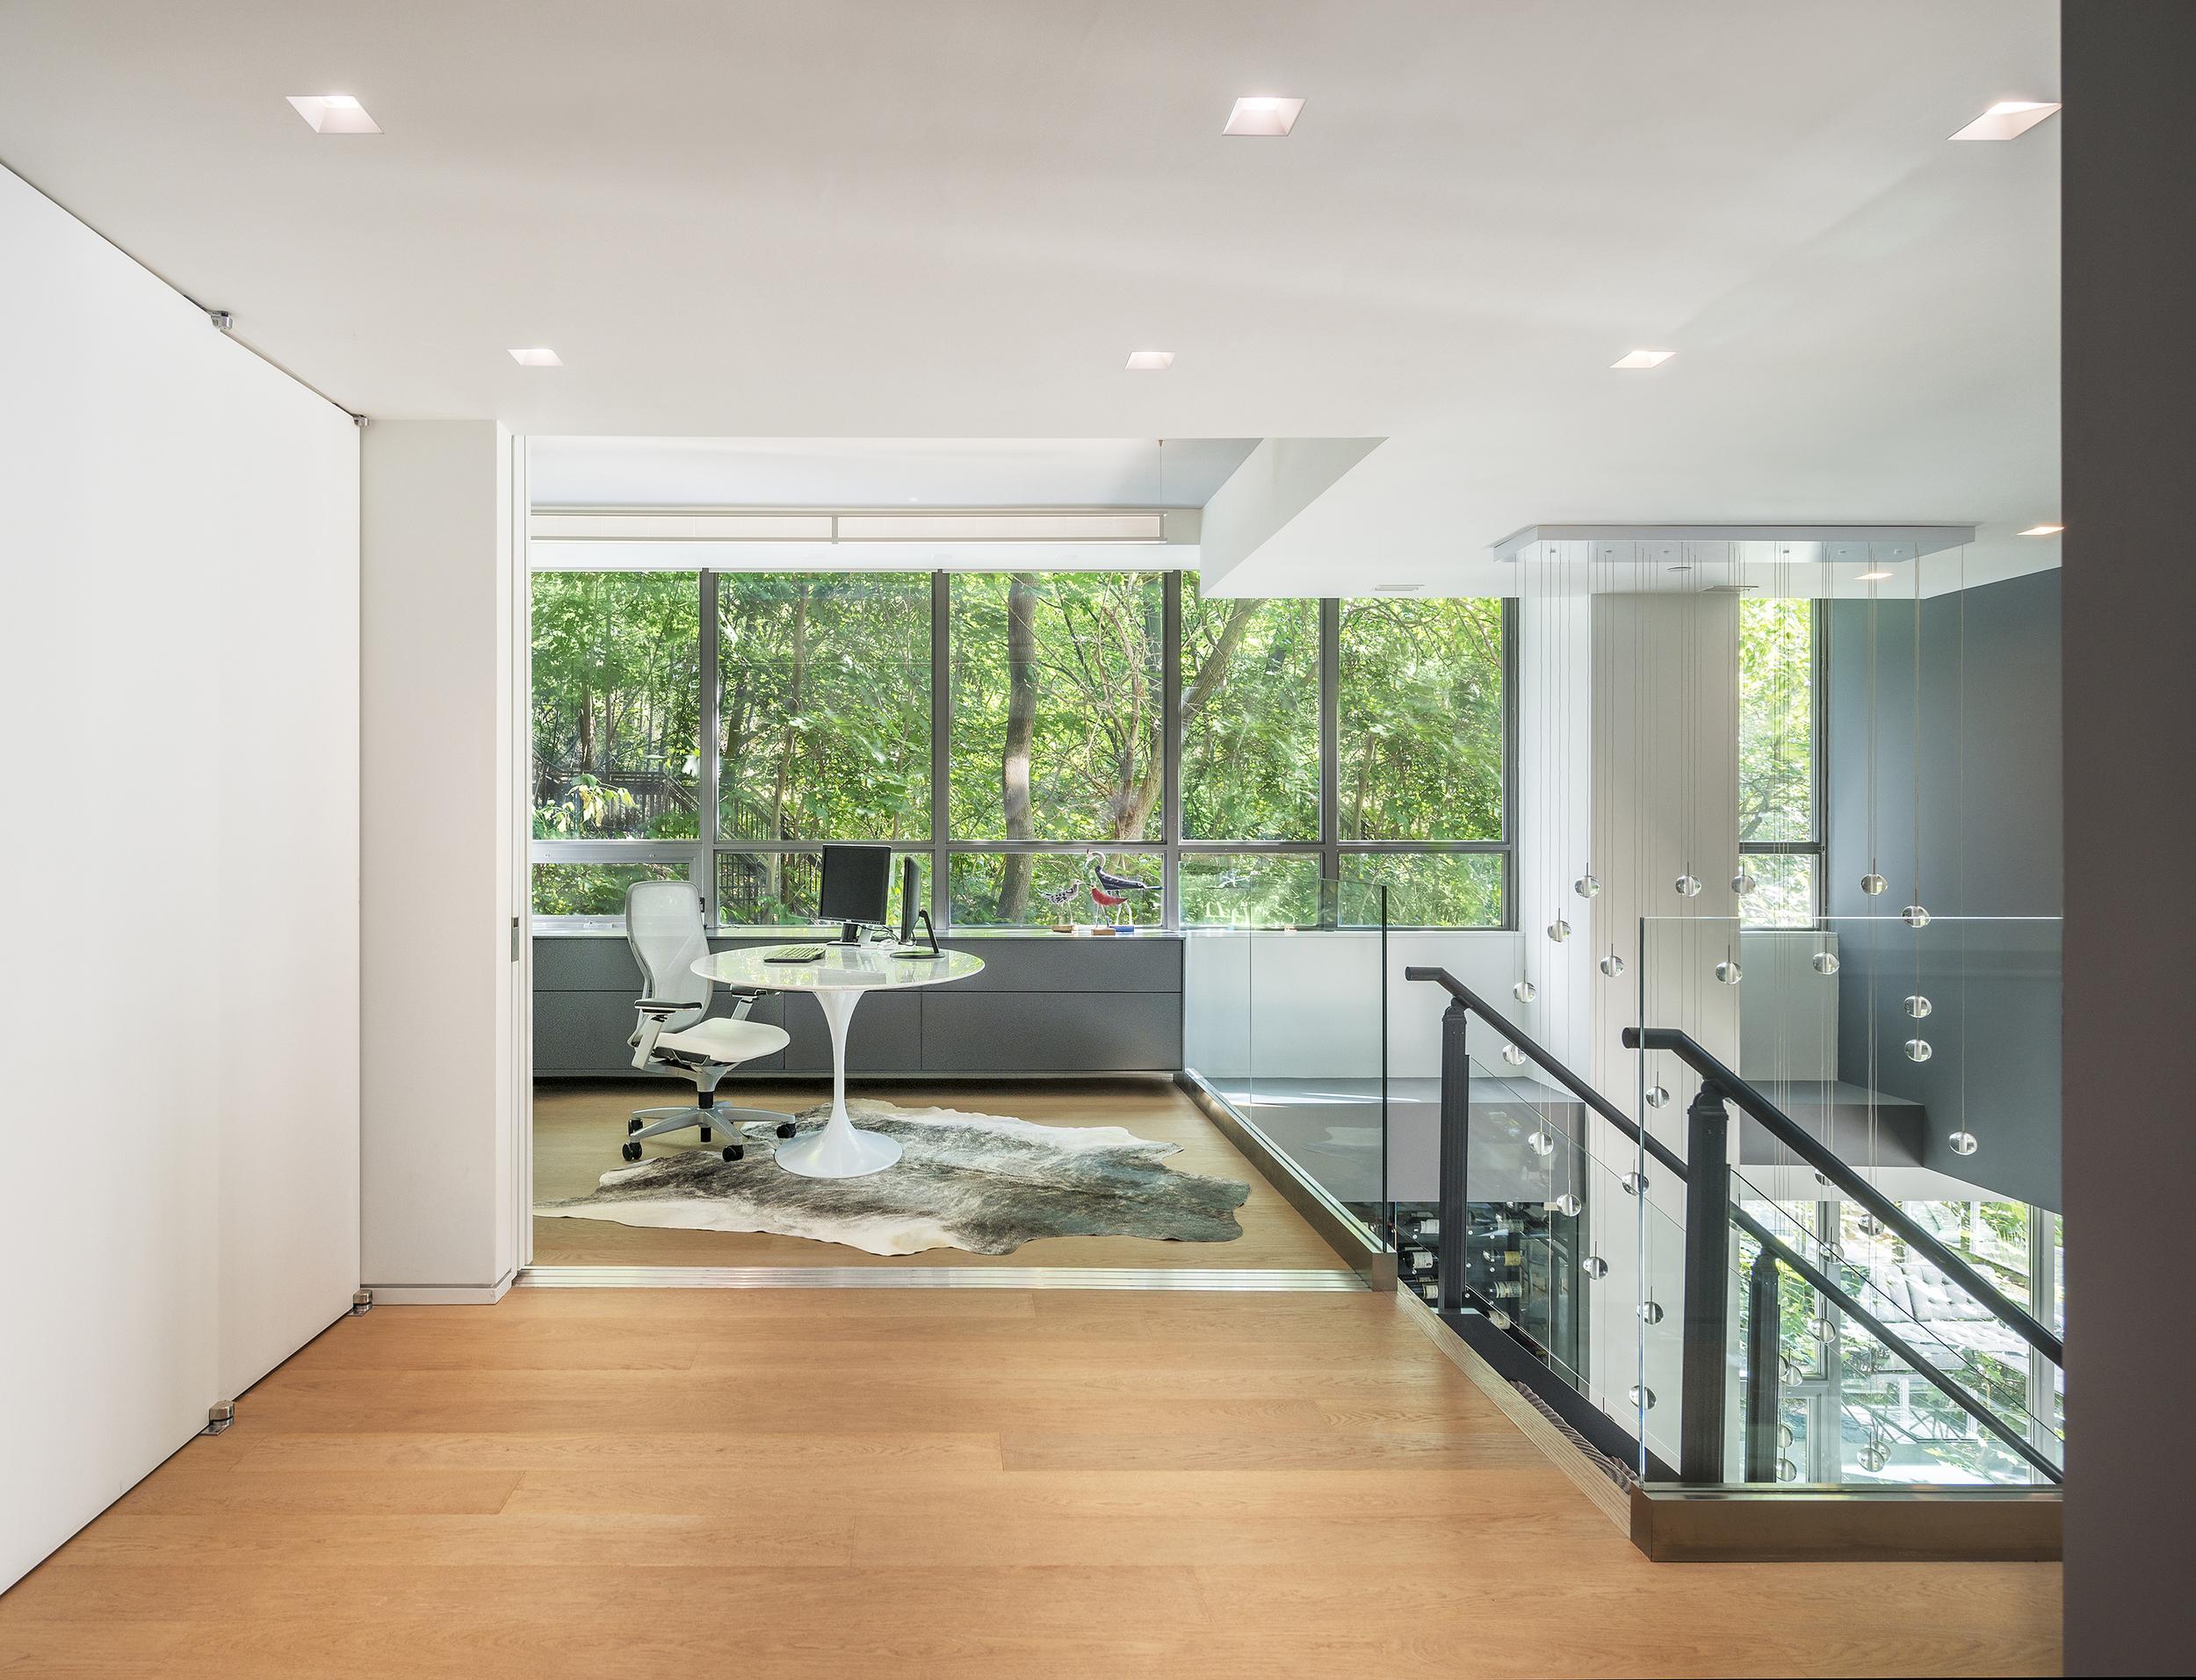 Ellis Park Road Condo | Jennifer Turner Architect